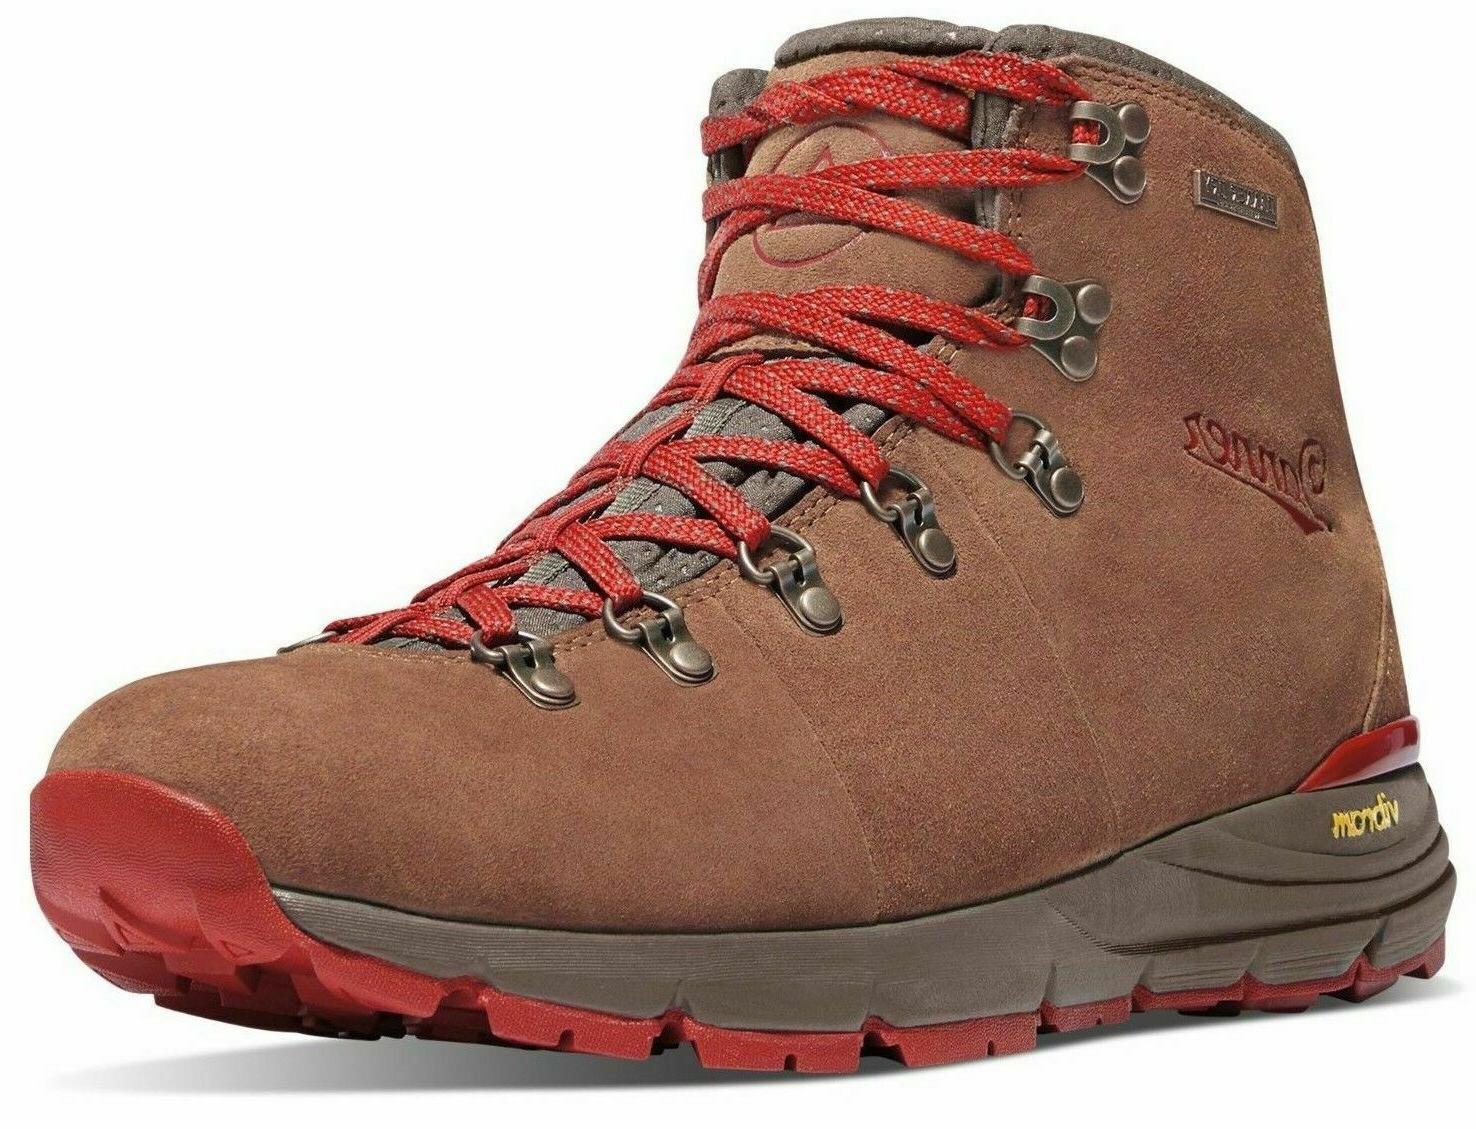 men s 62241 outdoor mountain 600 brown